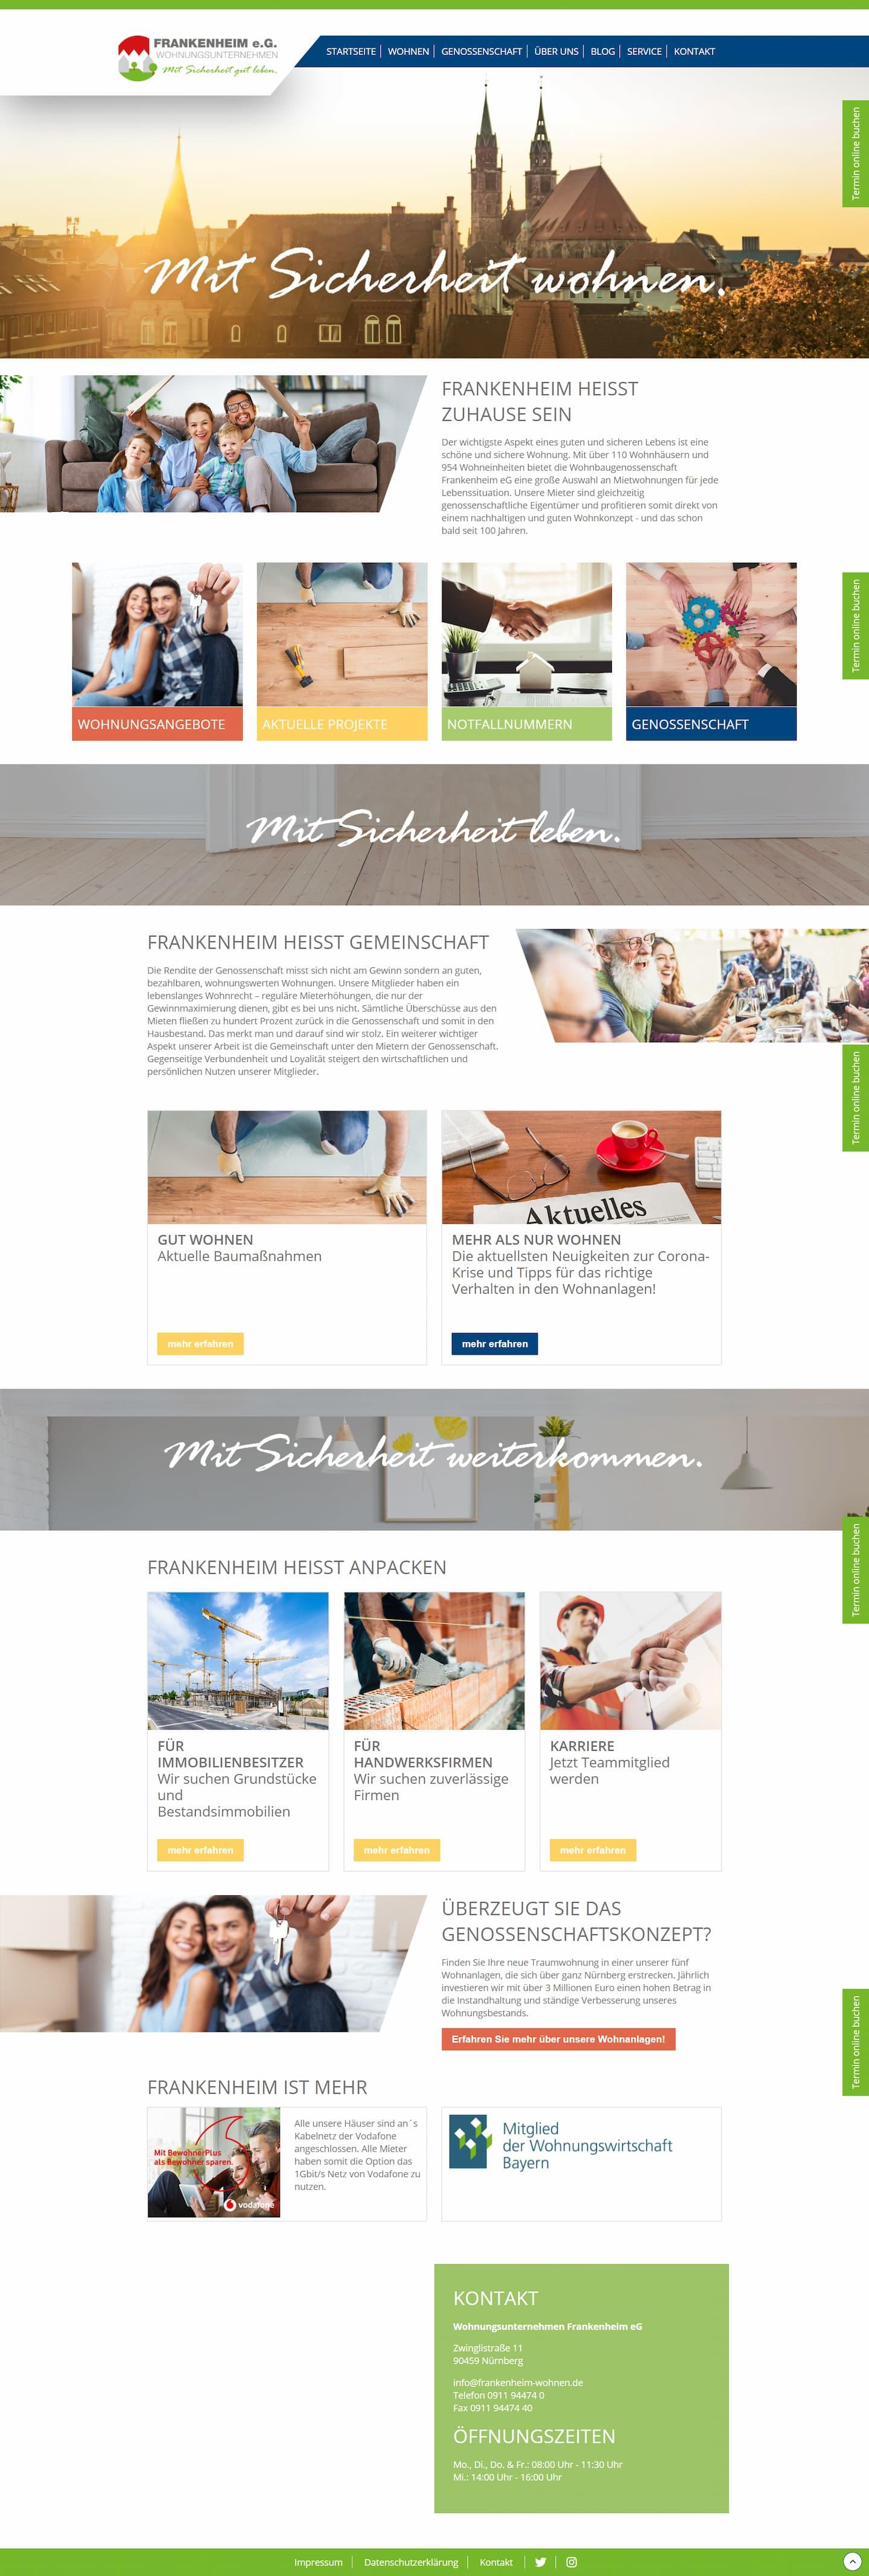 frankenheim-responsive-webdesign-desktop